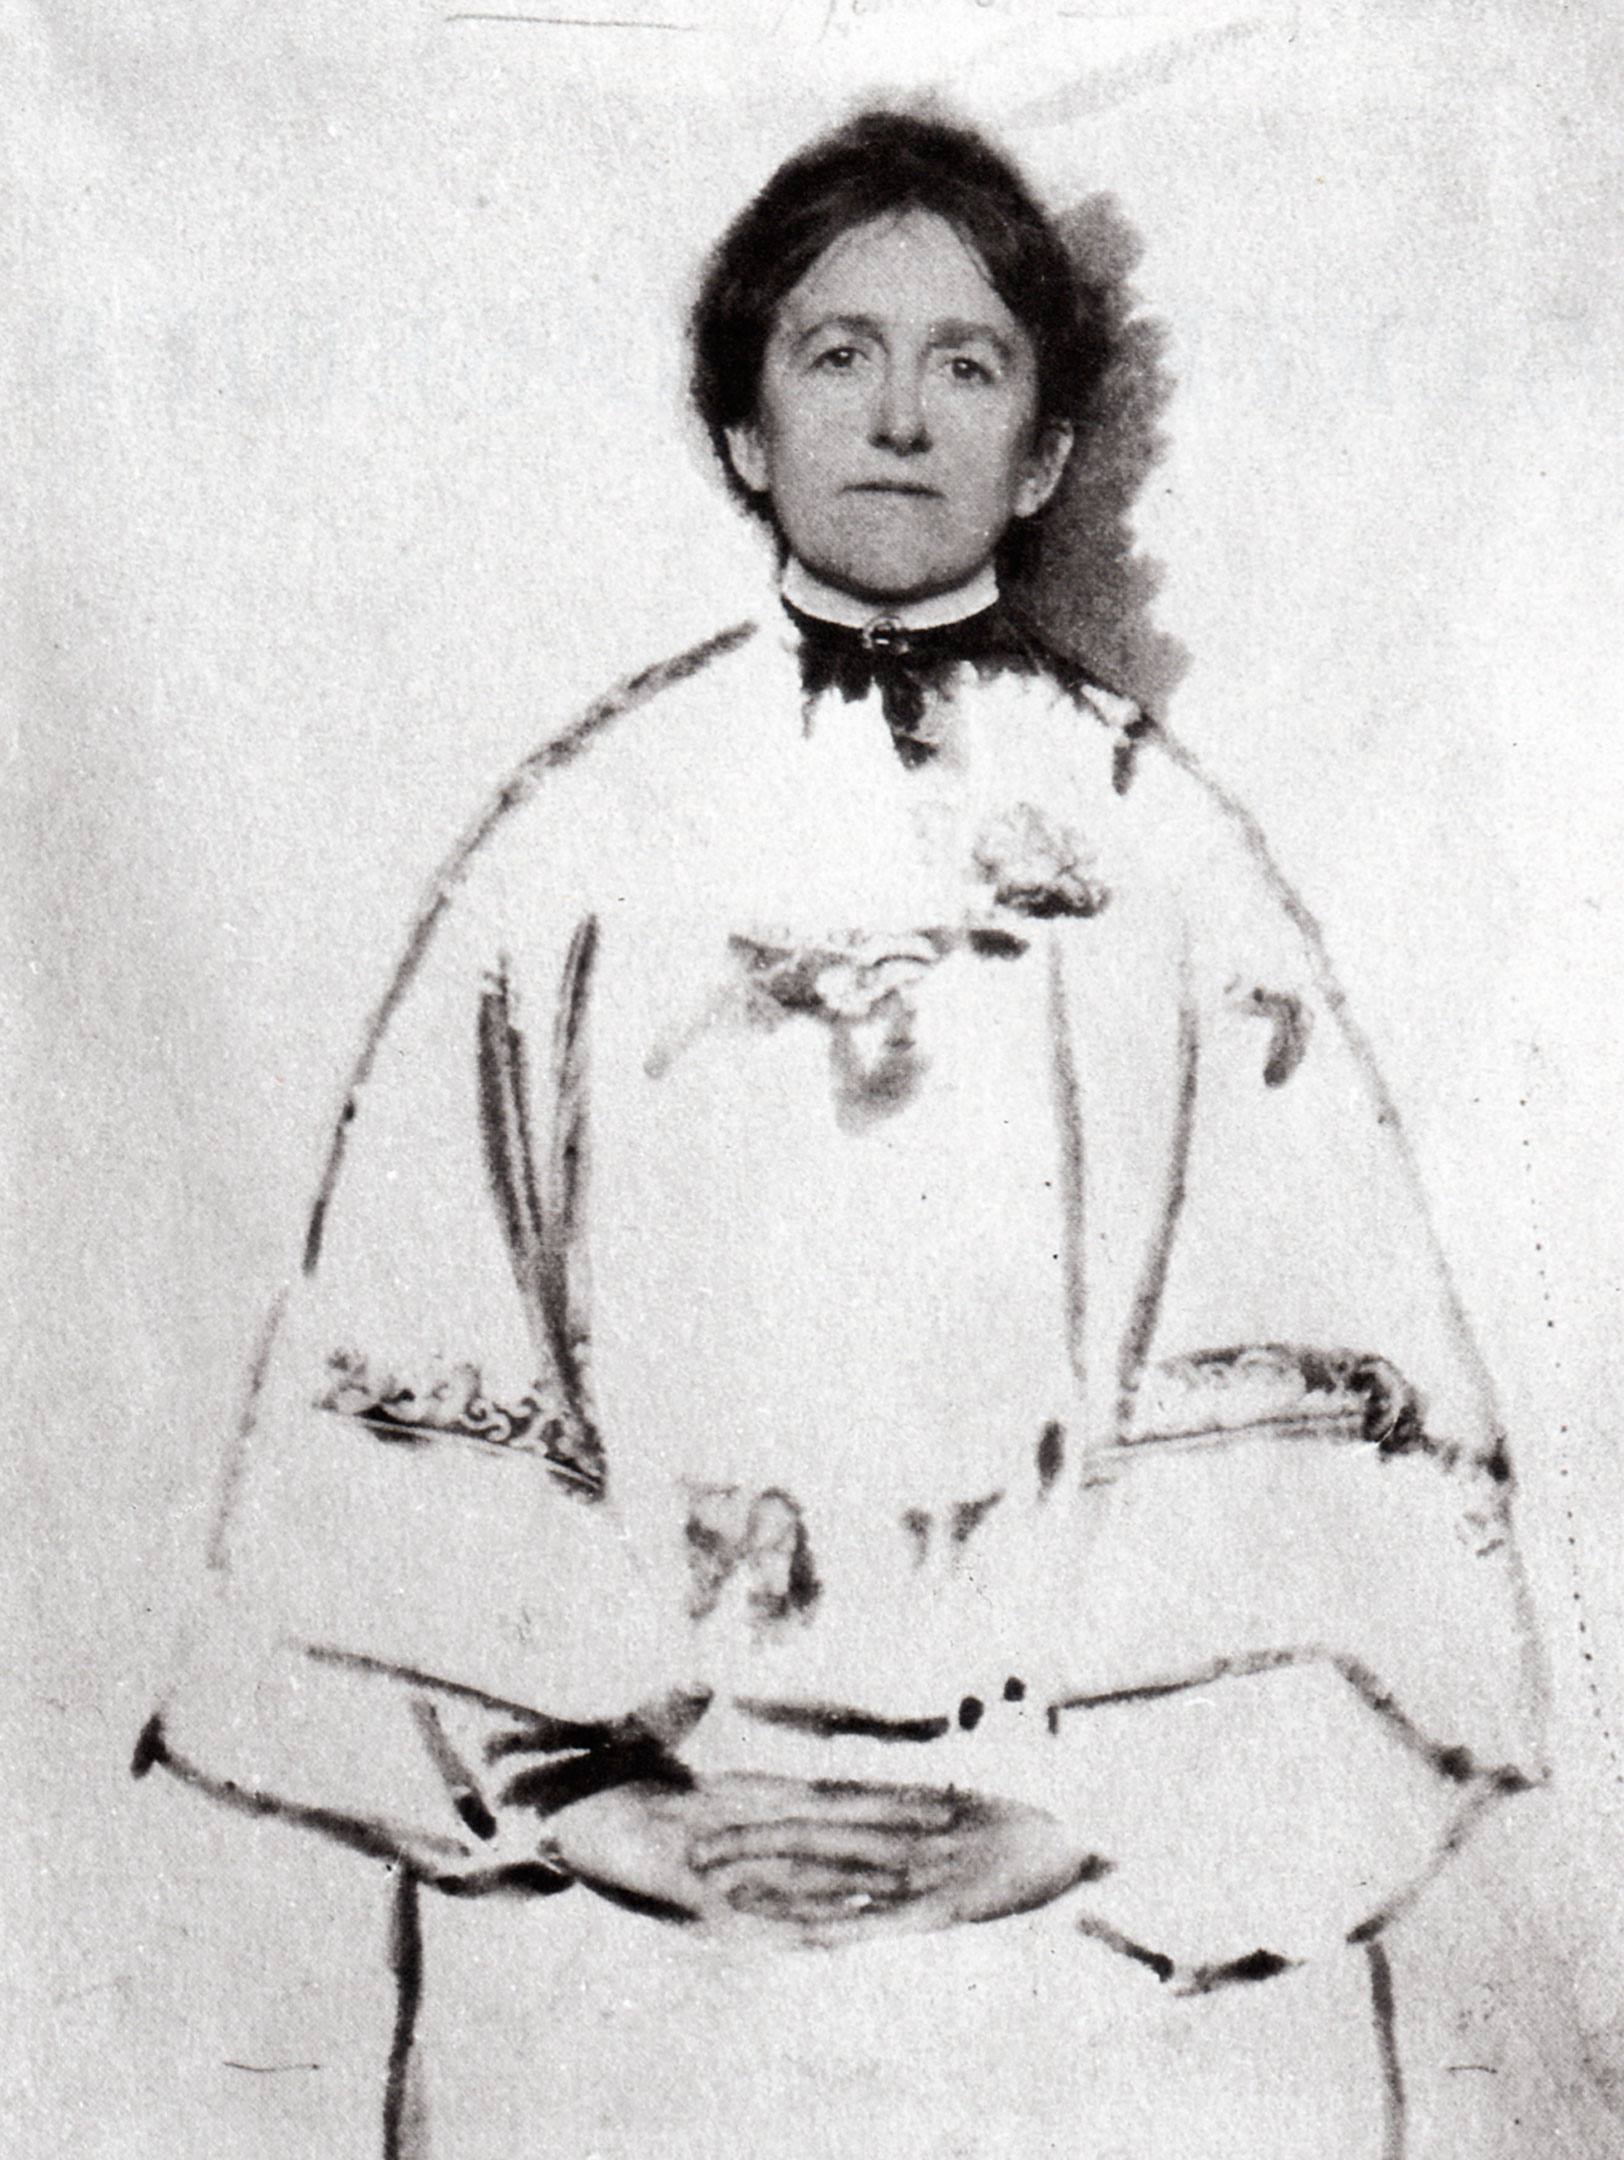 Image of Gertrude Käsebier from Wikidata